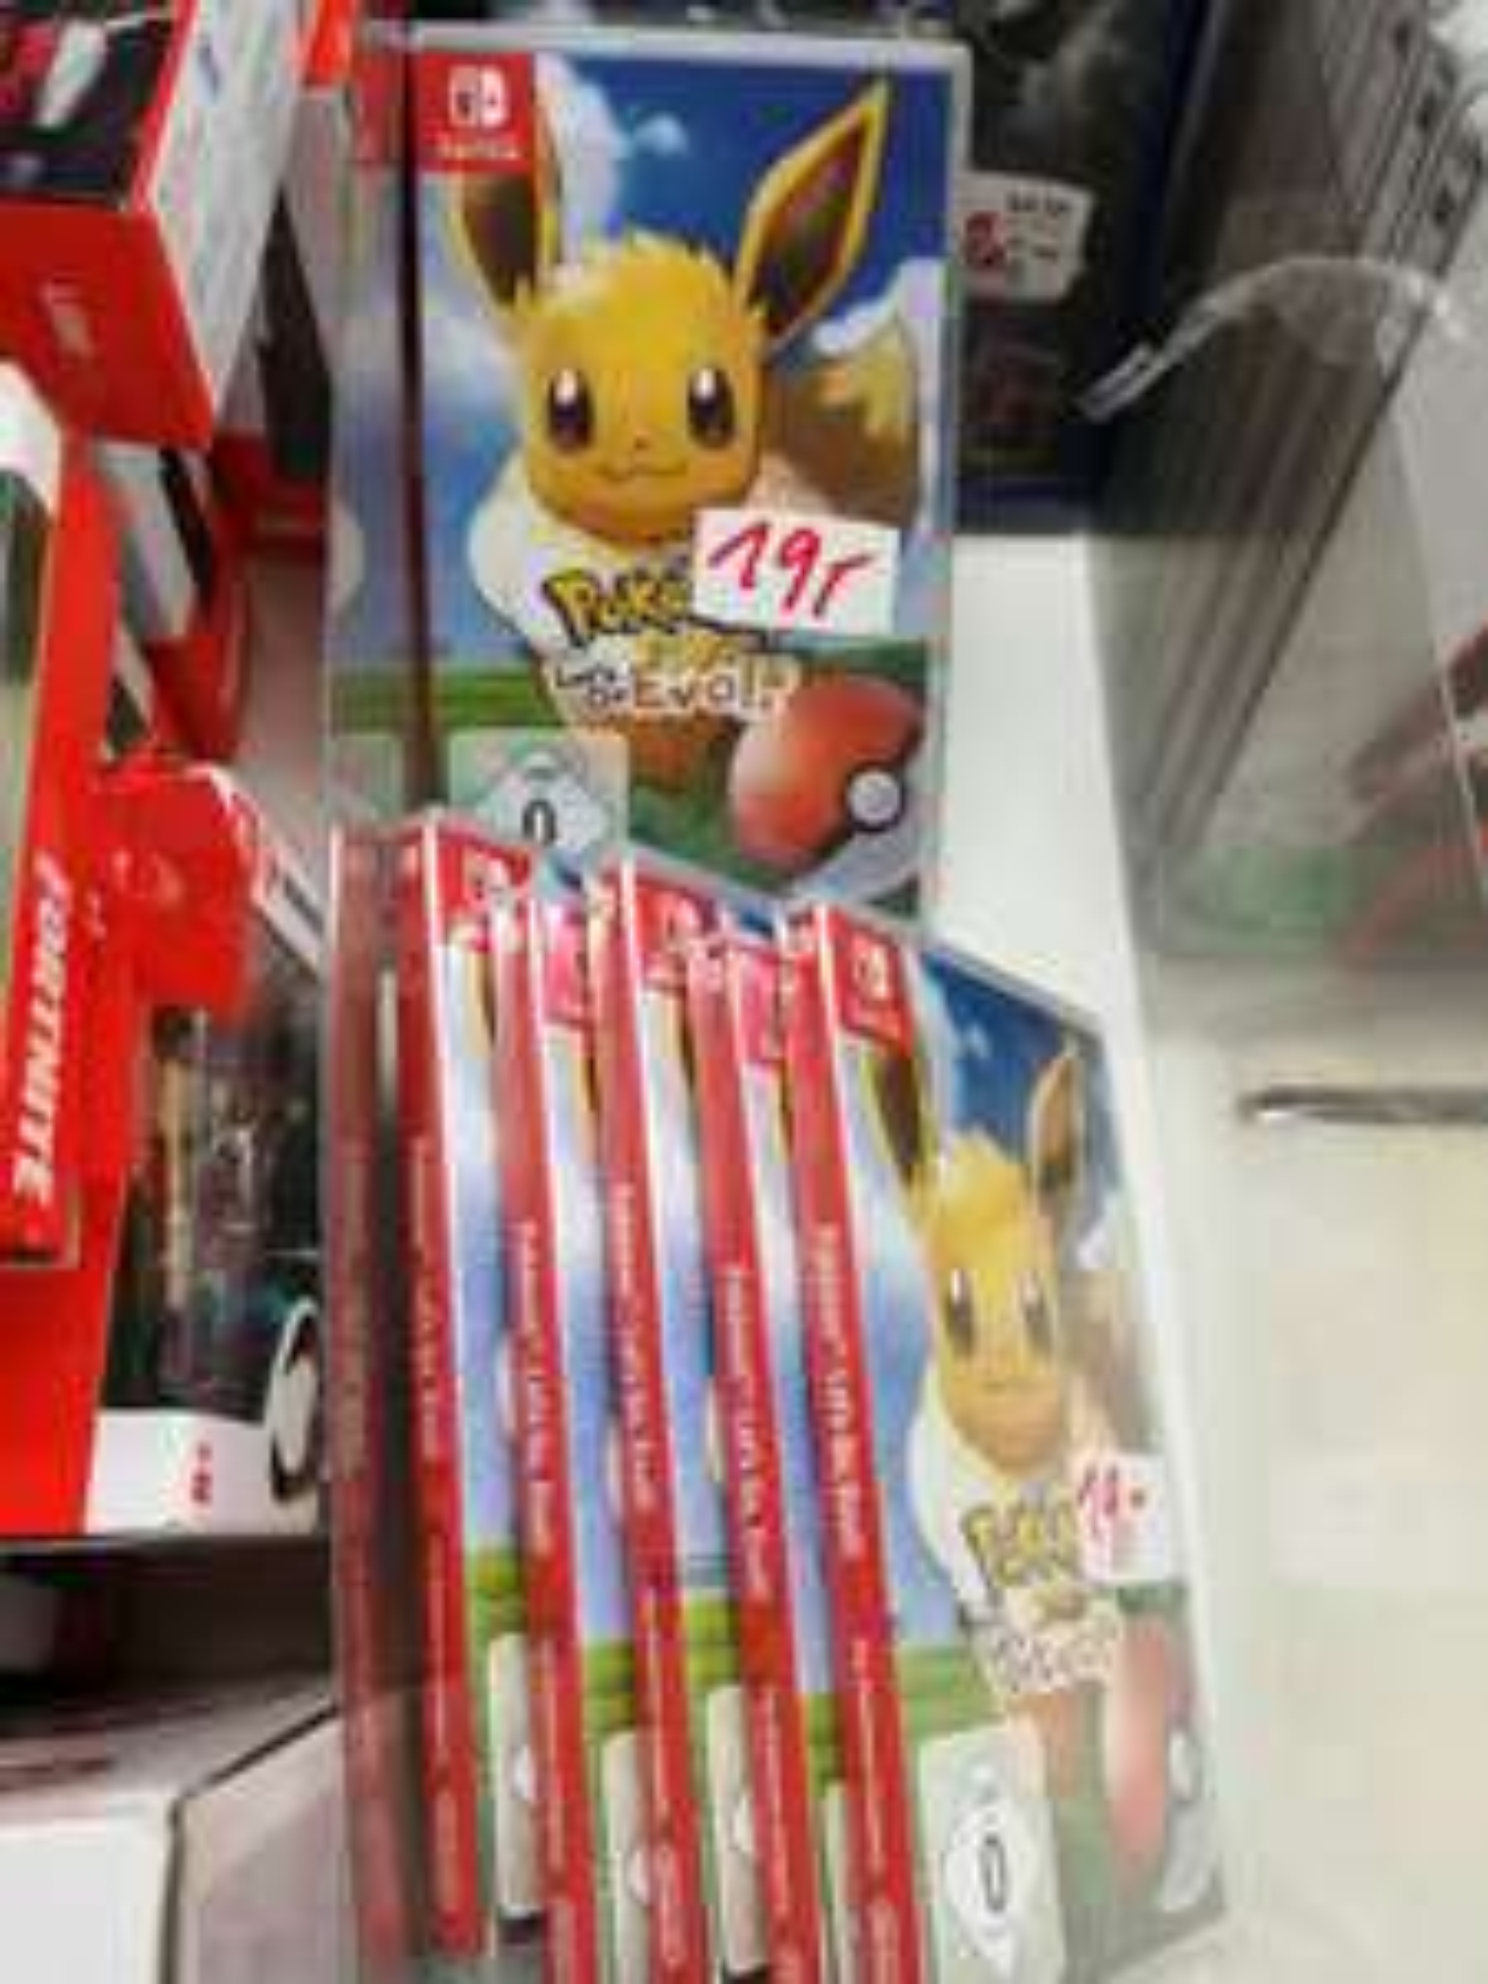 [LOKAL Buxtehude] [Media Markt] Pokémon Let's go Evoli für Nintendo Switch